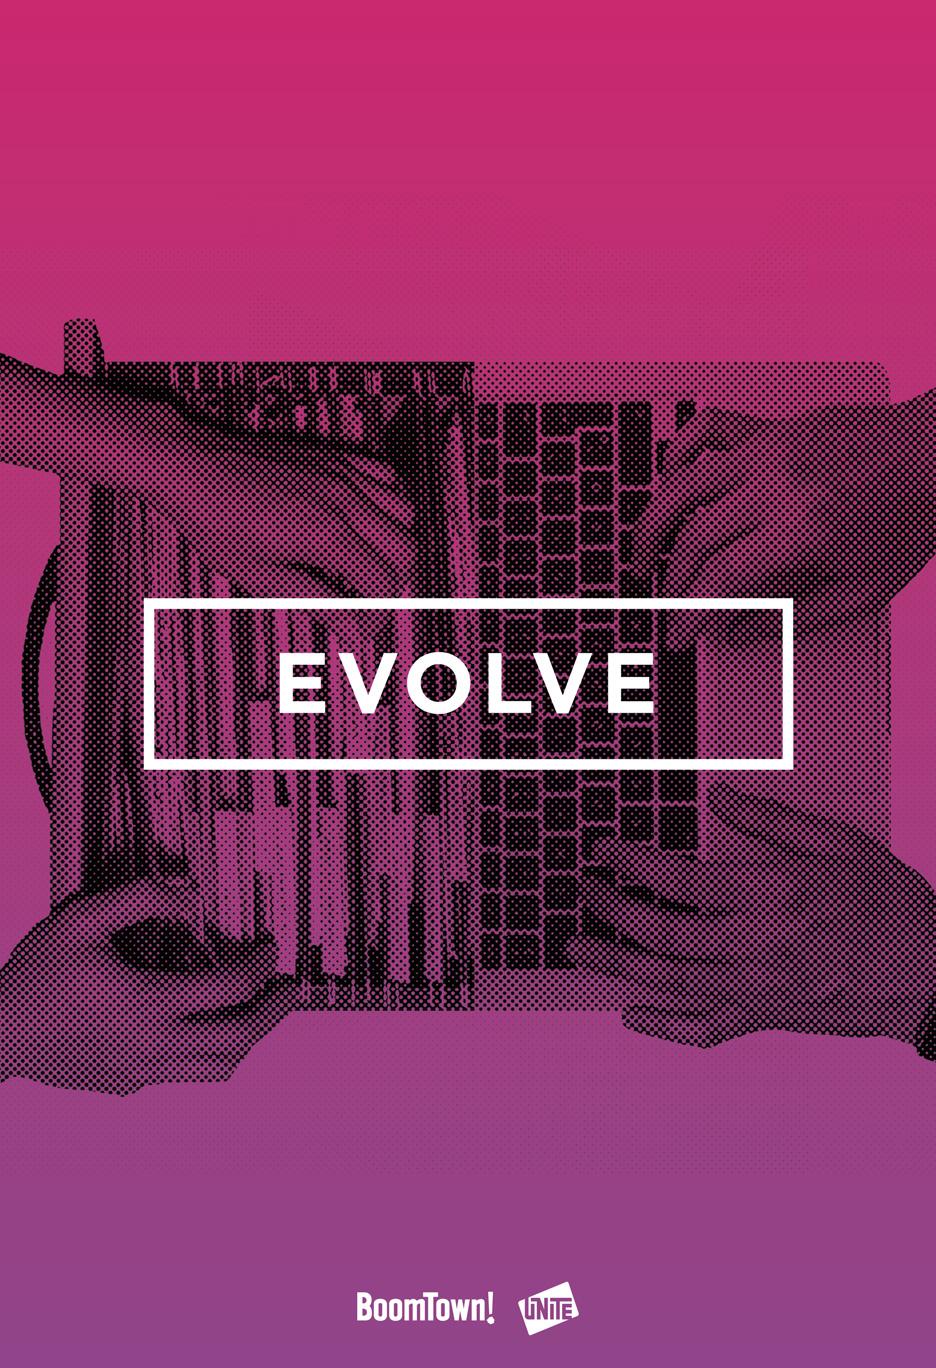 evolve-3.jpg